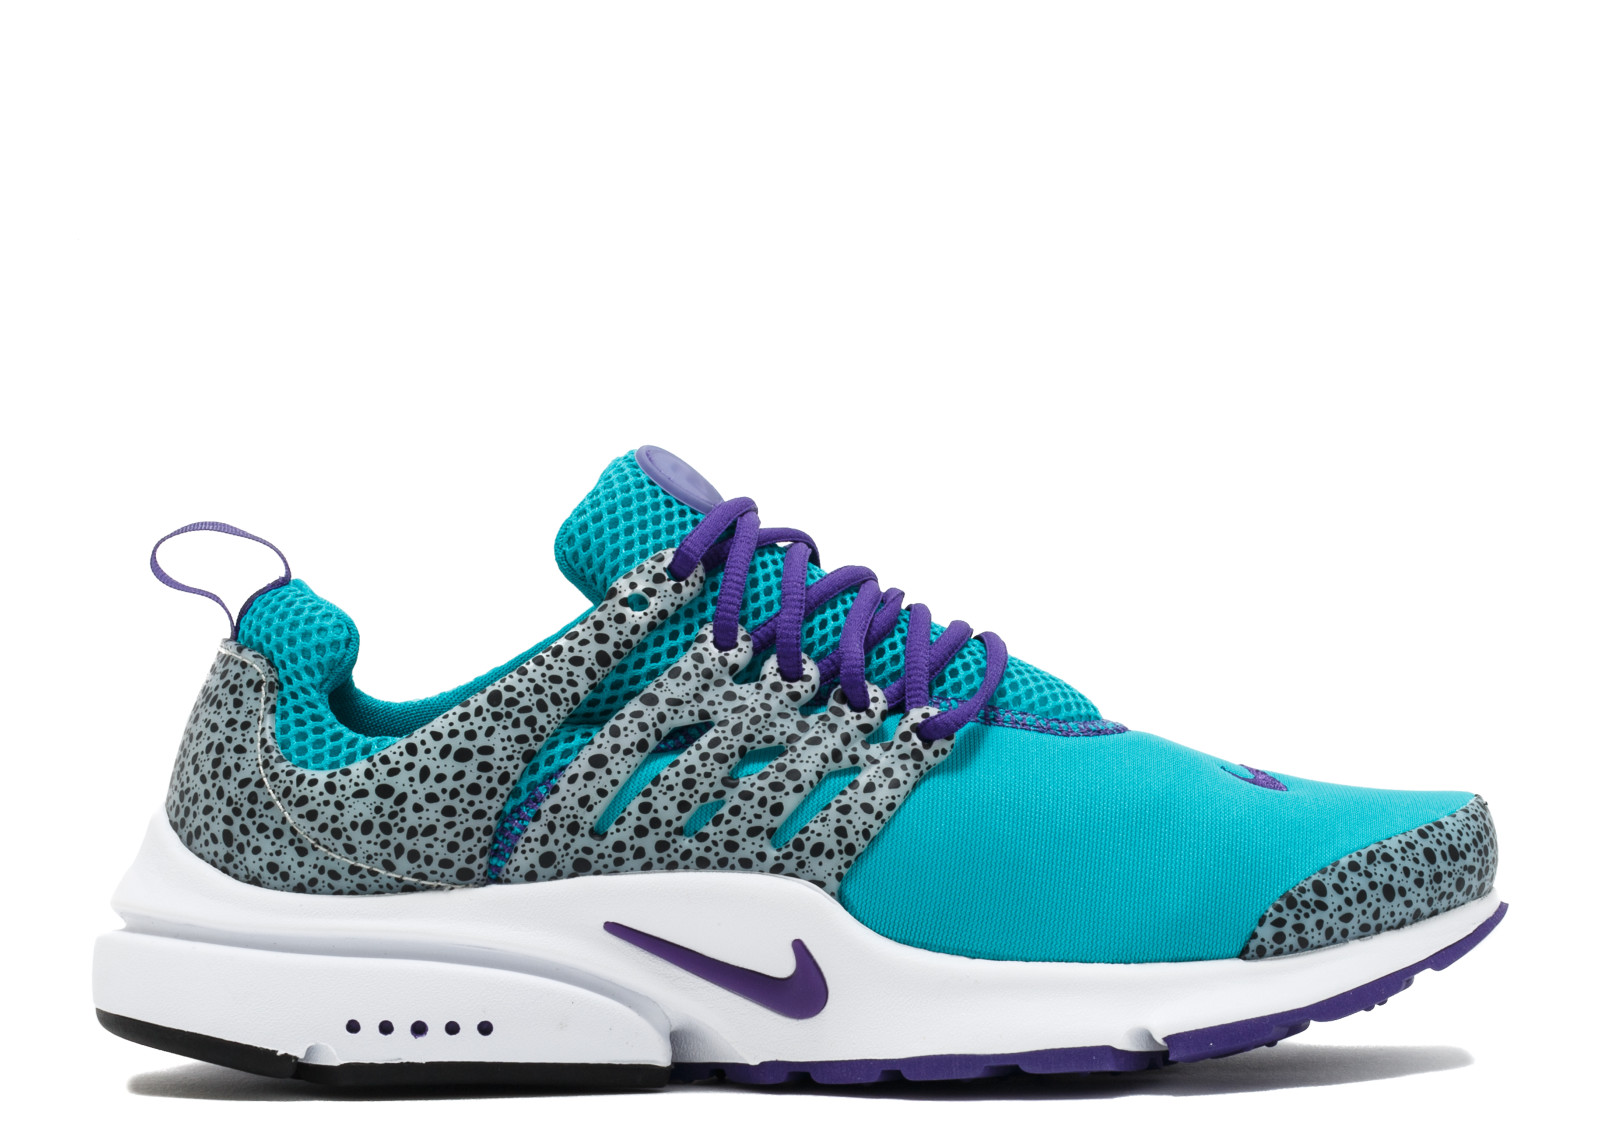 nike presto safari mens running shoes